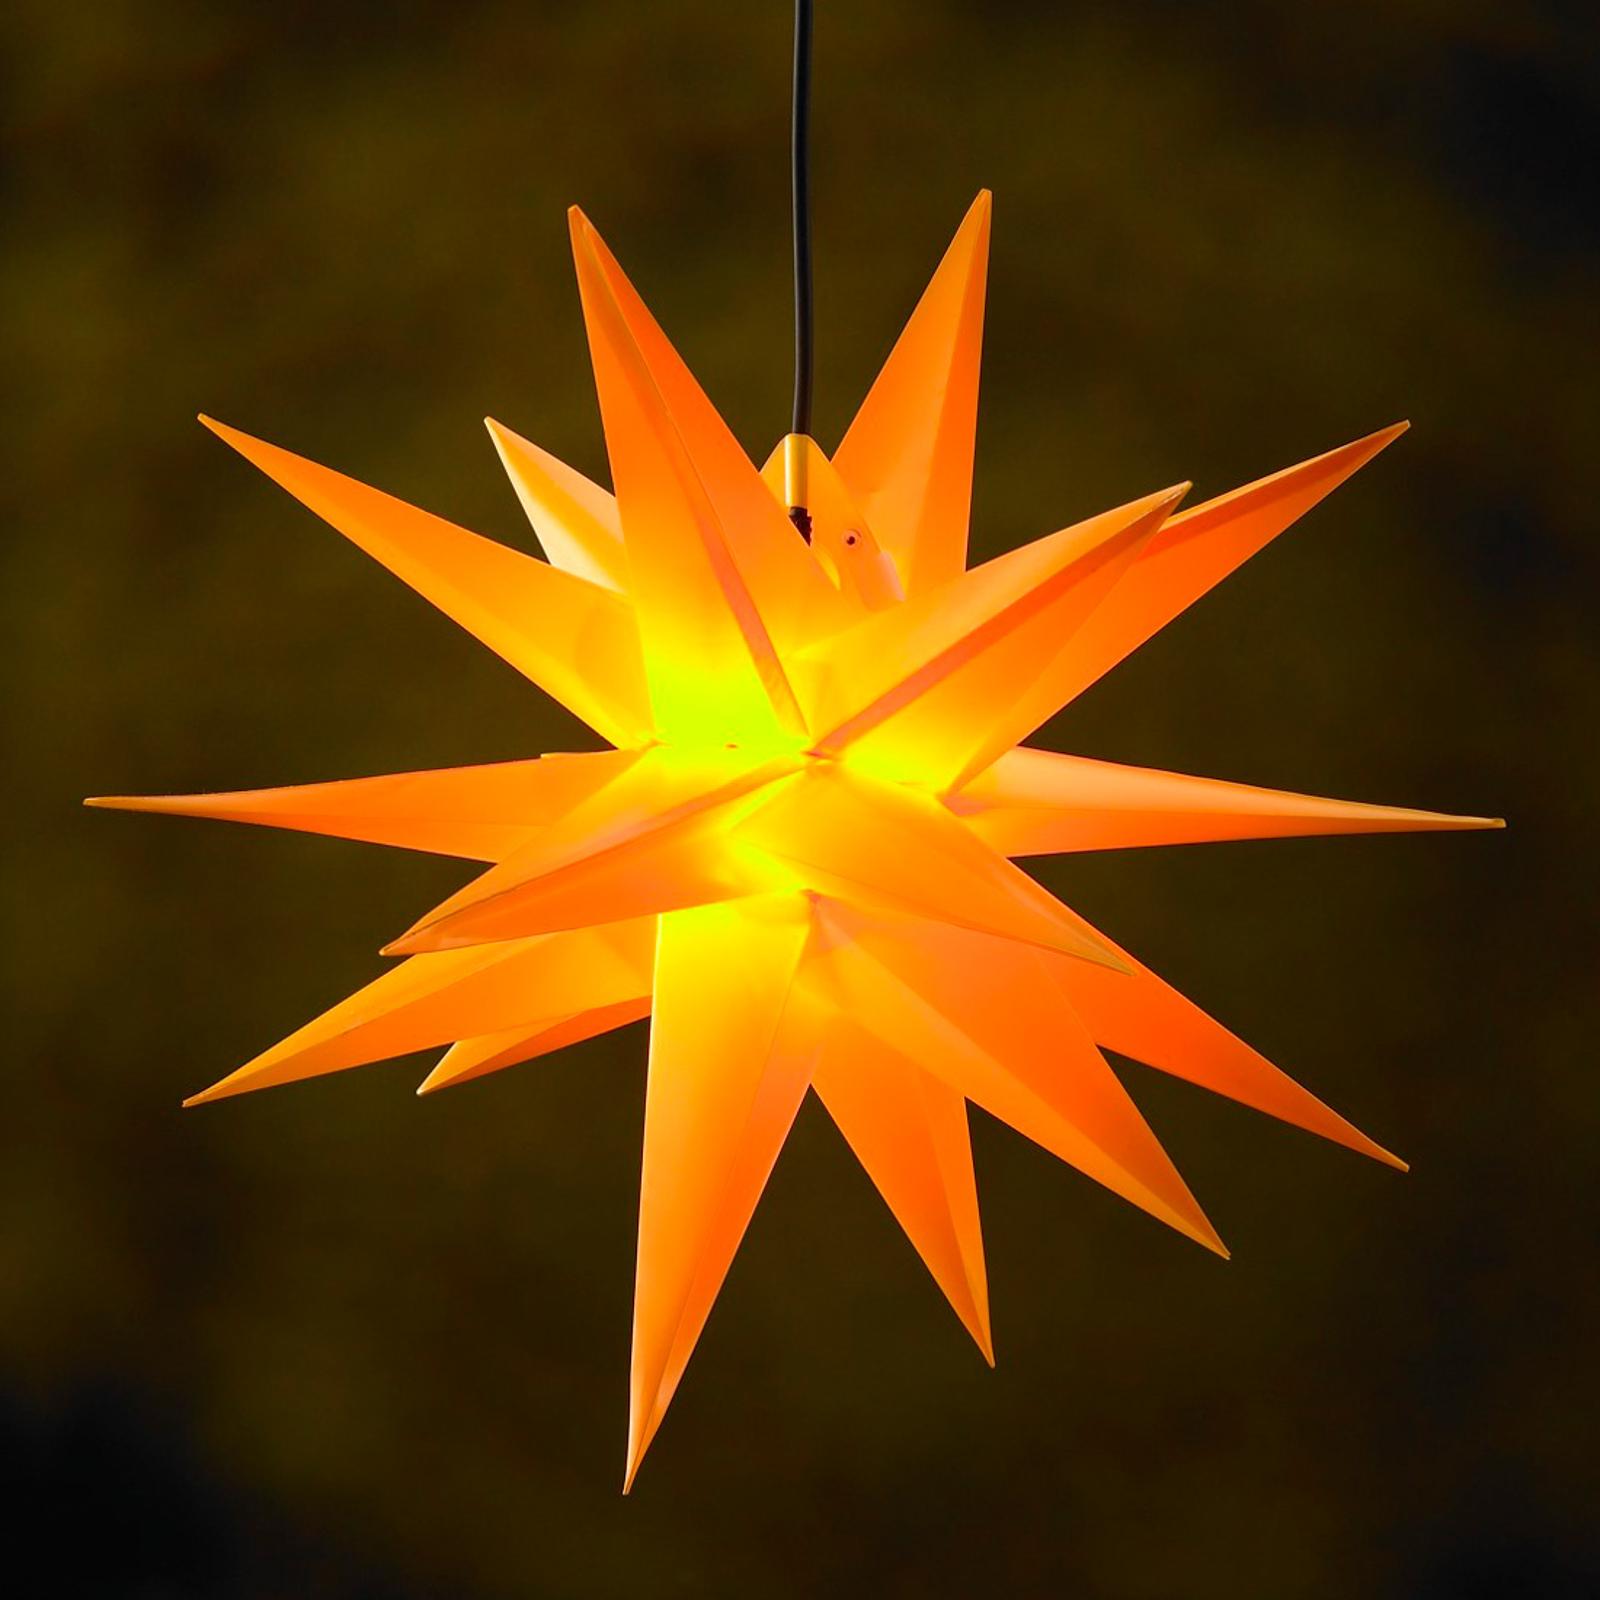 Gul kunststof-stjerne Jumbo, udendørs, 18 takker